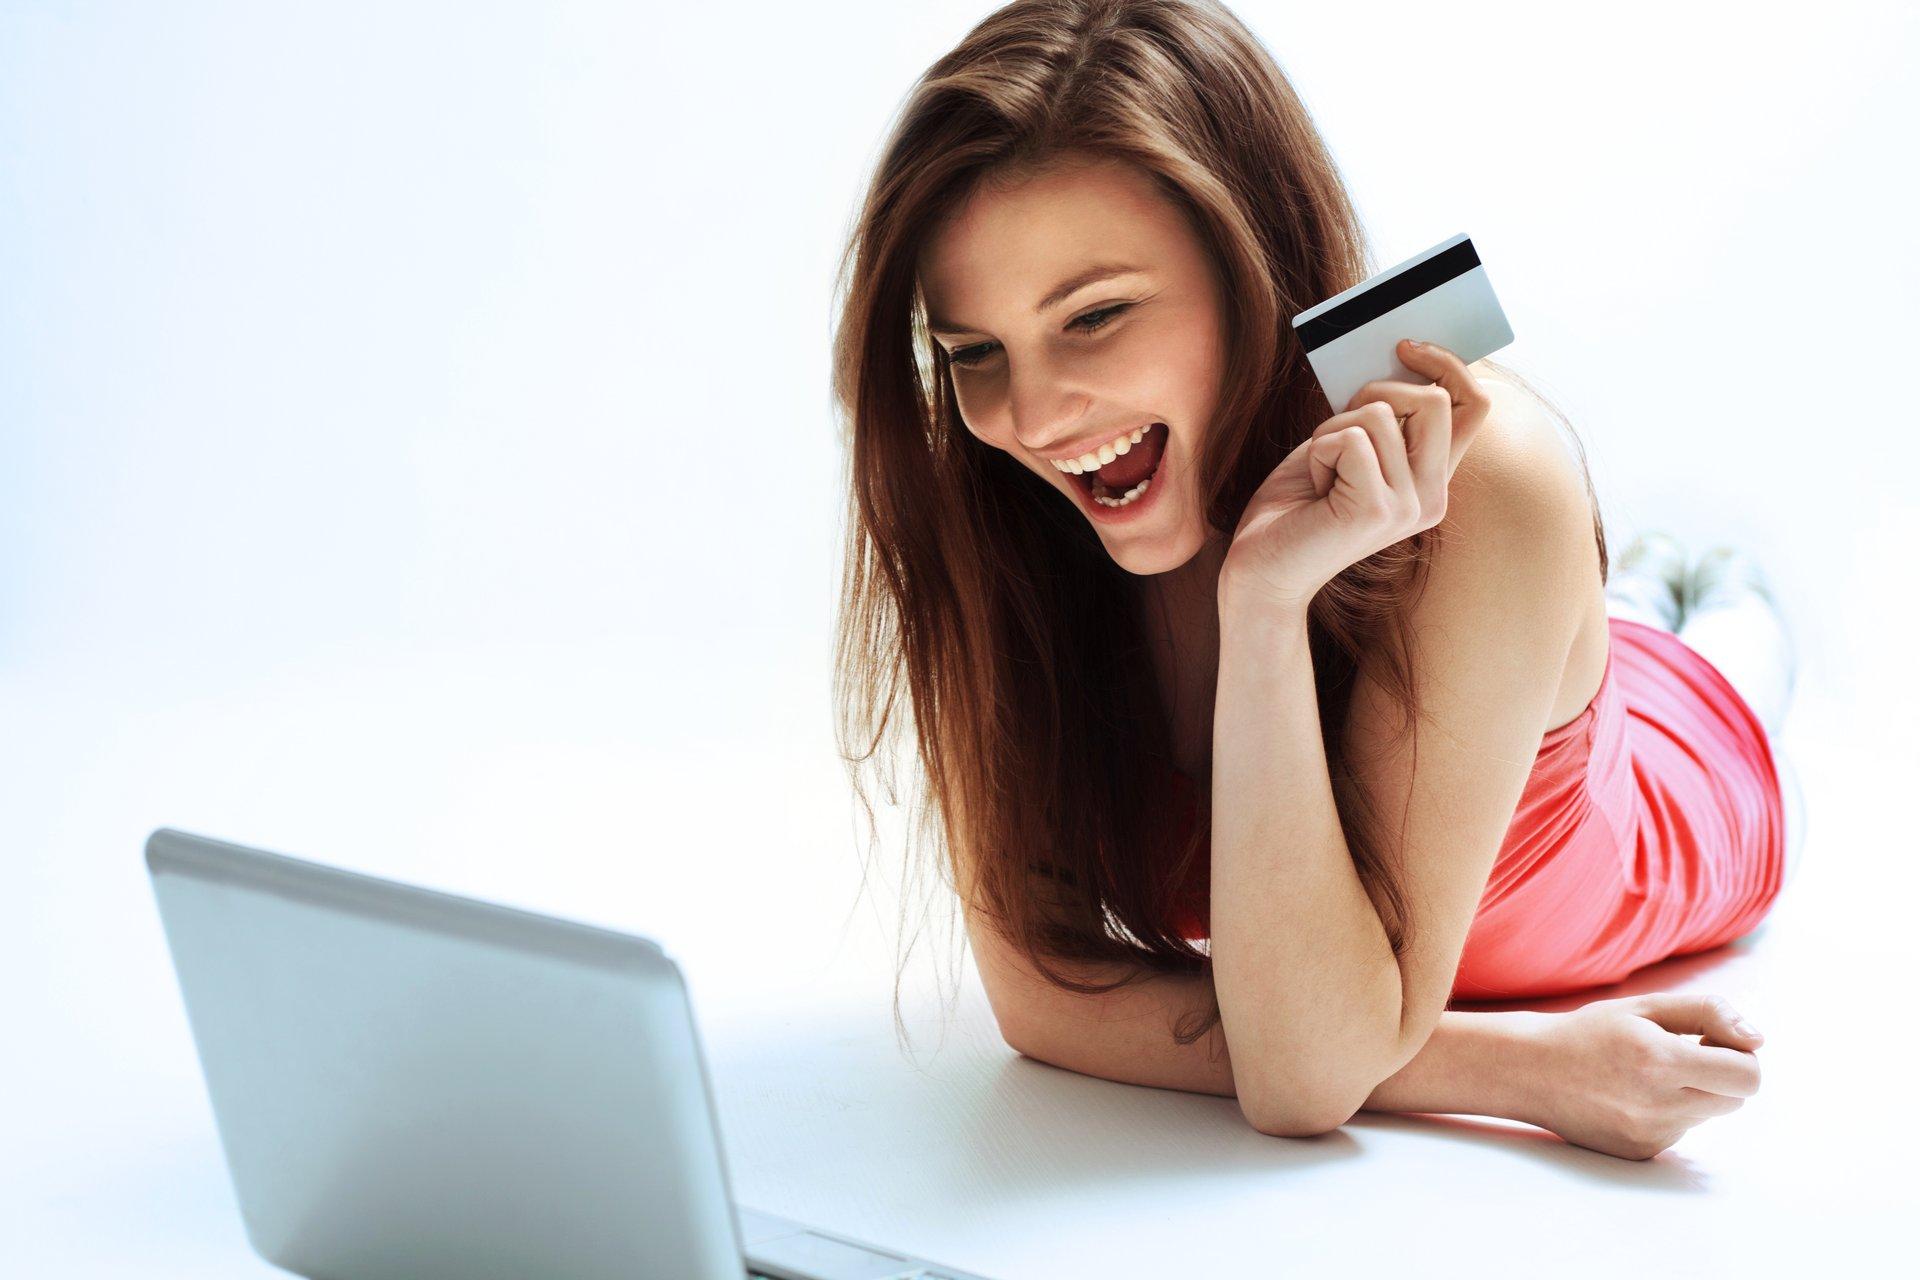 Woman w credit card